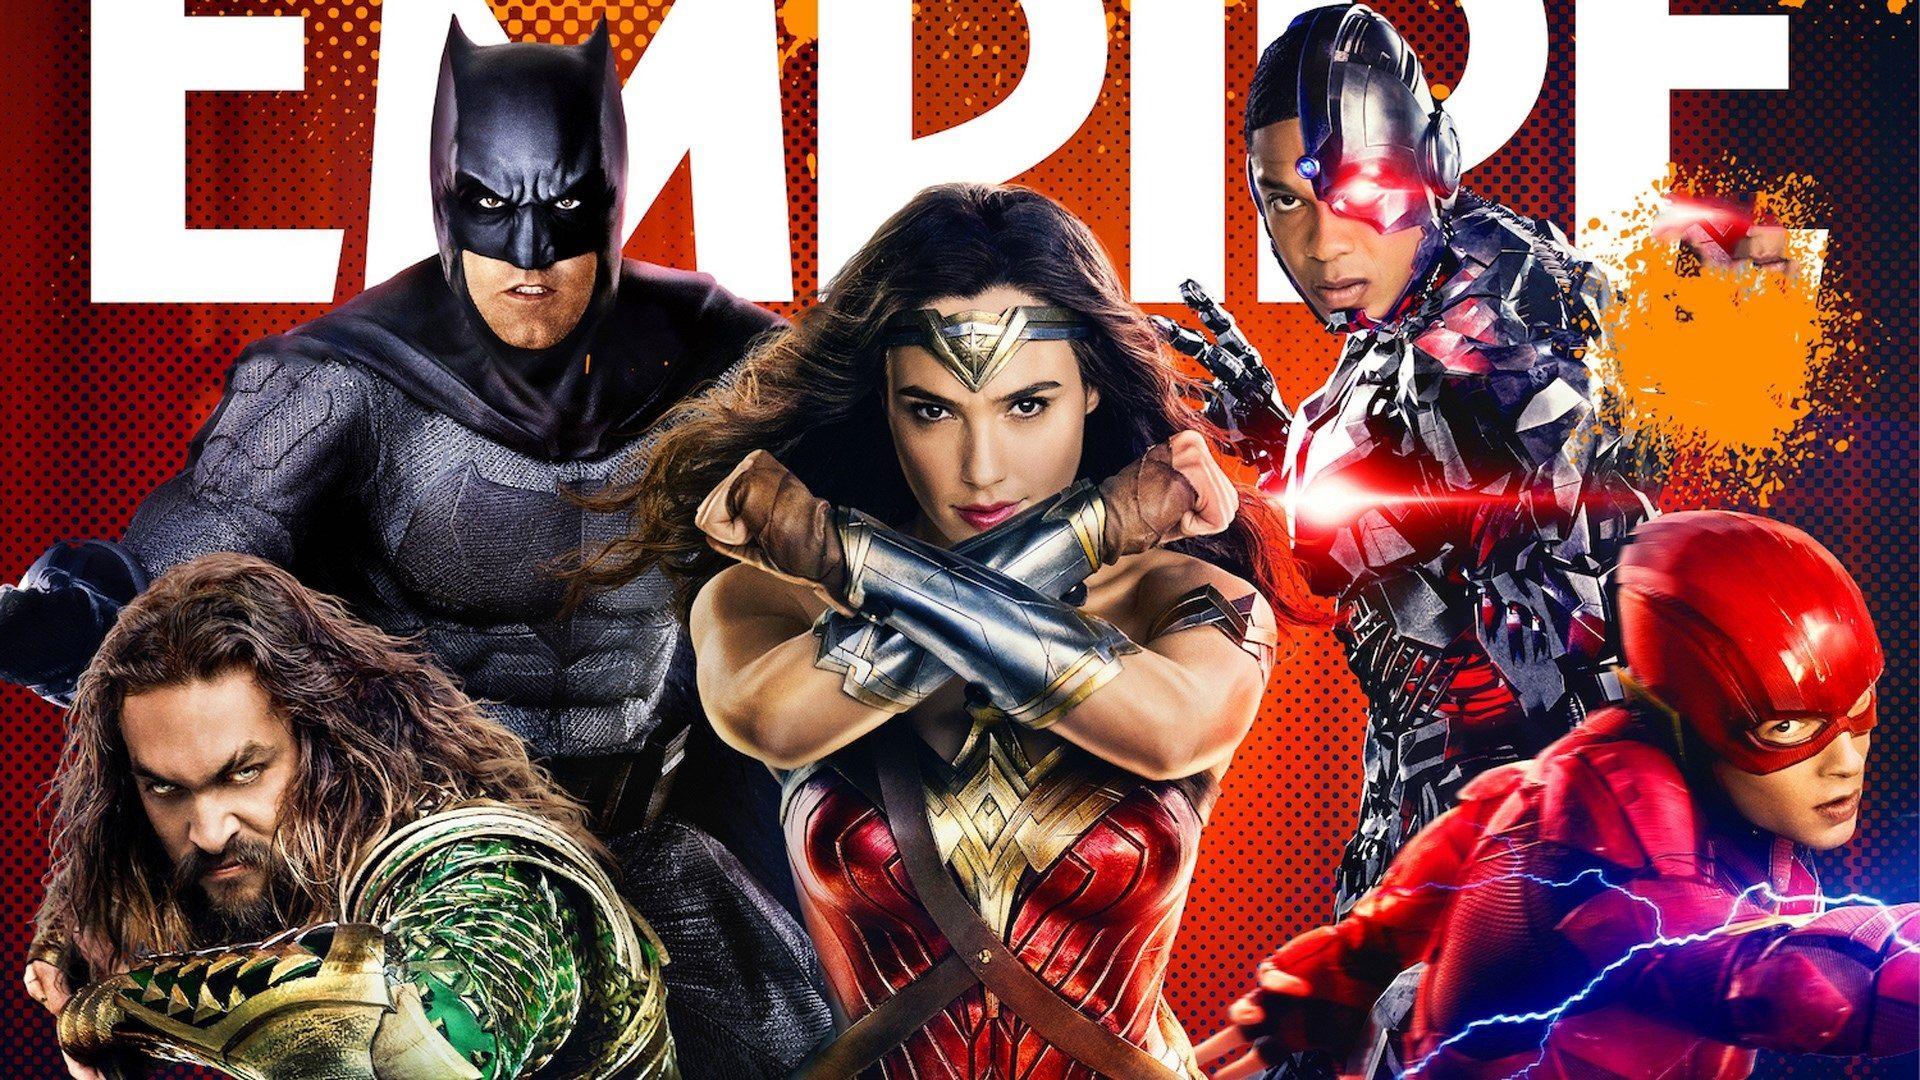 1920x1080 Justice League Full Screen Wallpaper Hd